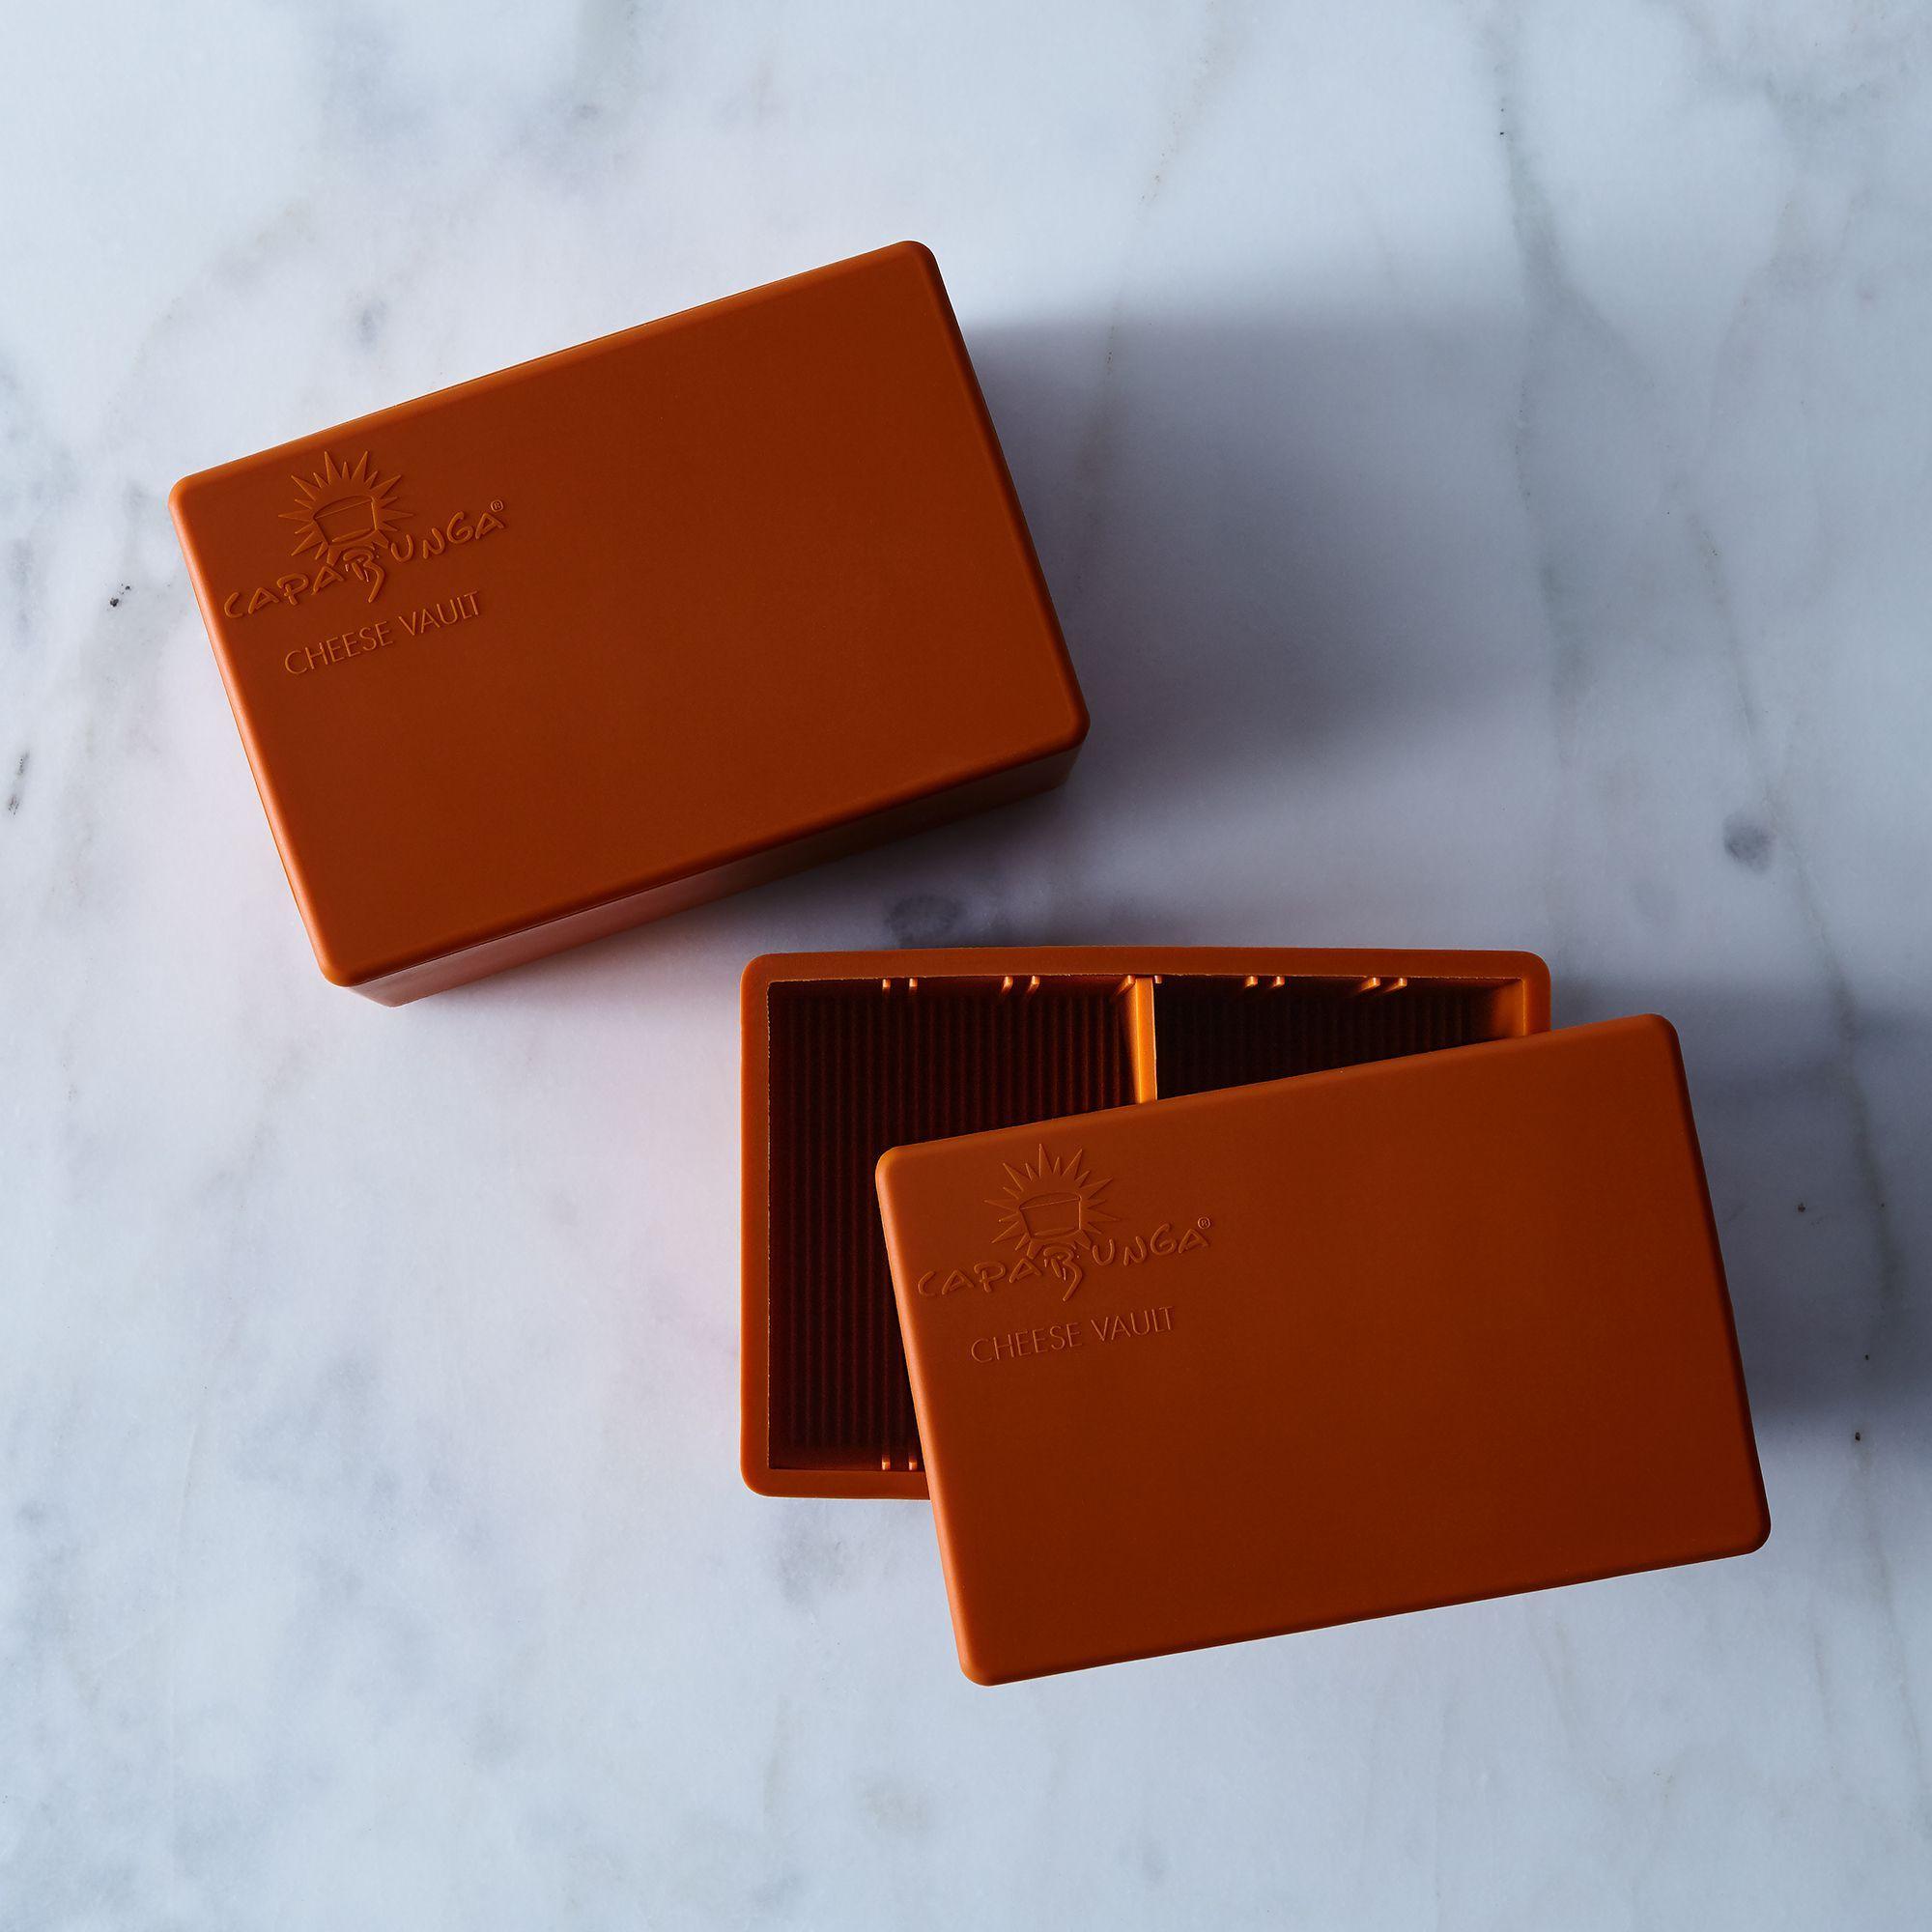 Cheese Vault (Set of 2)